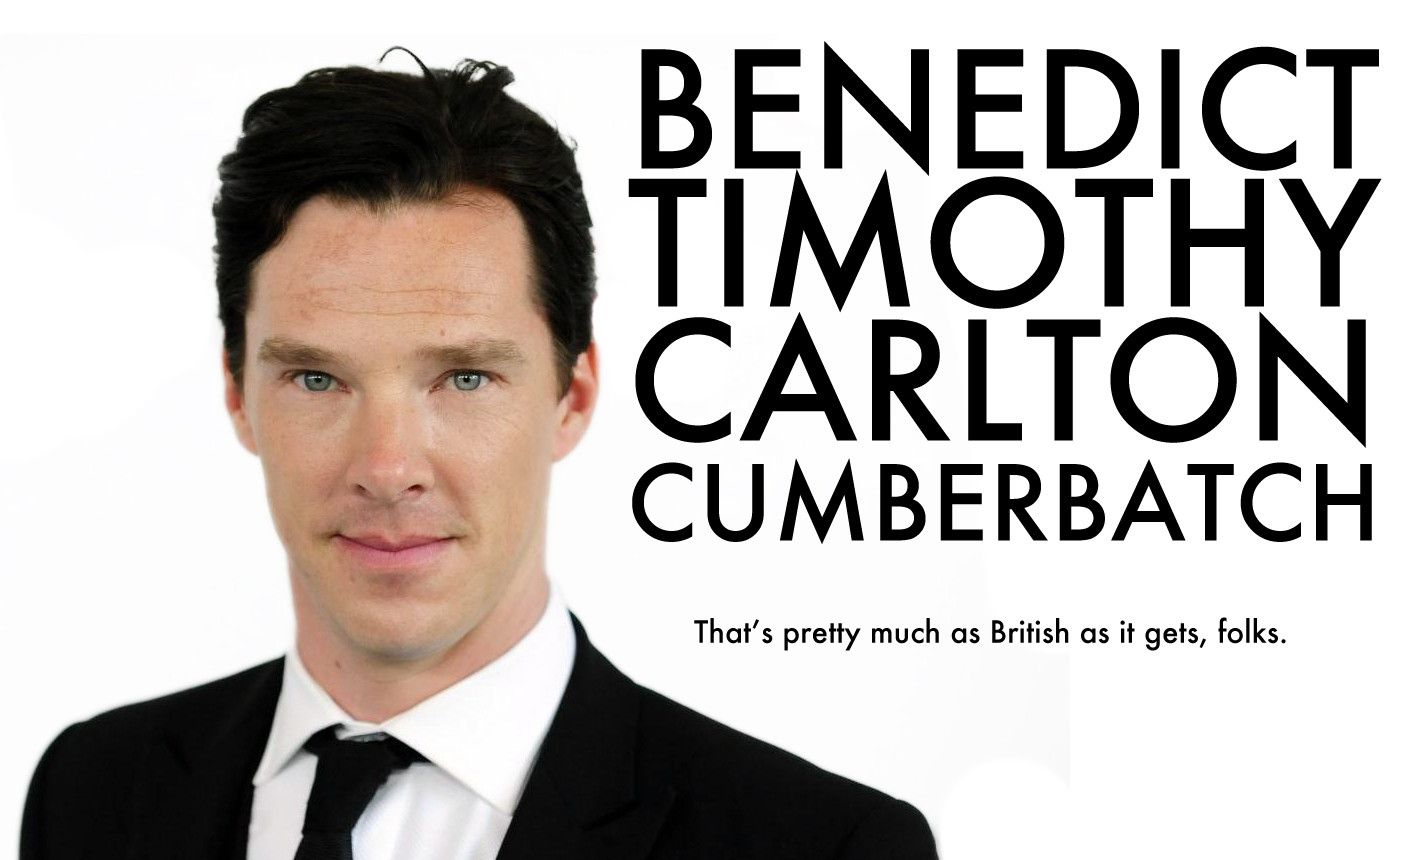 That is quite the name... Benedict Cumberbatch Name